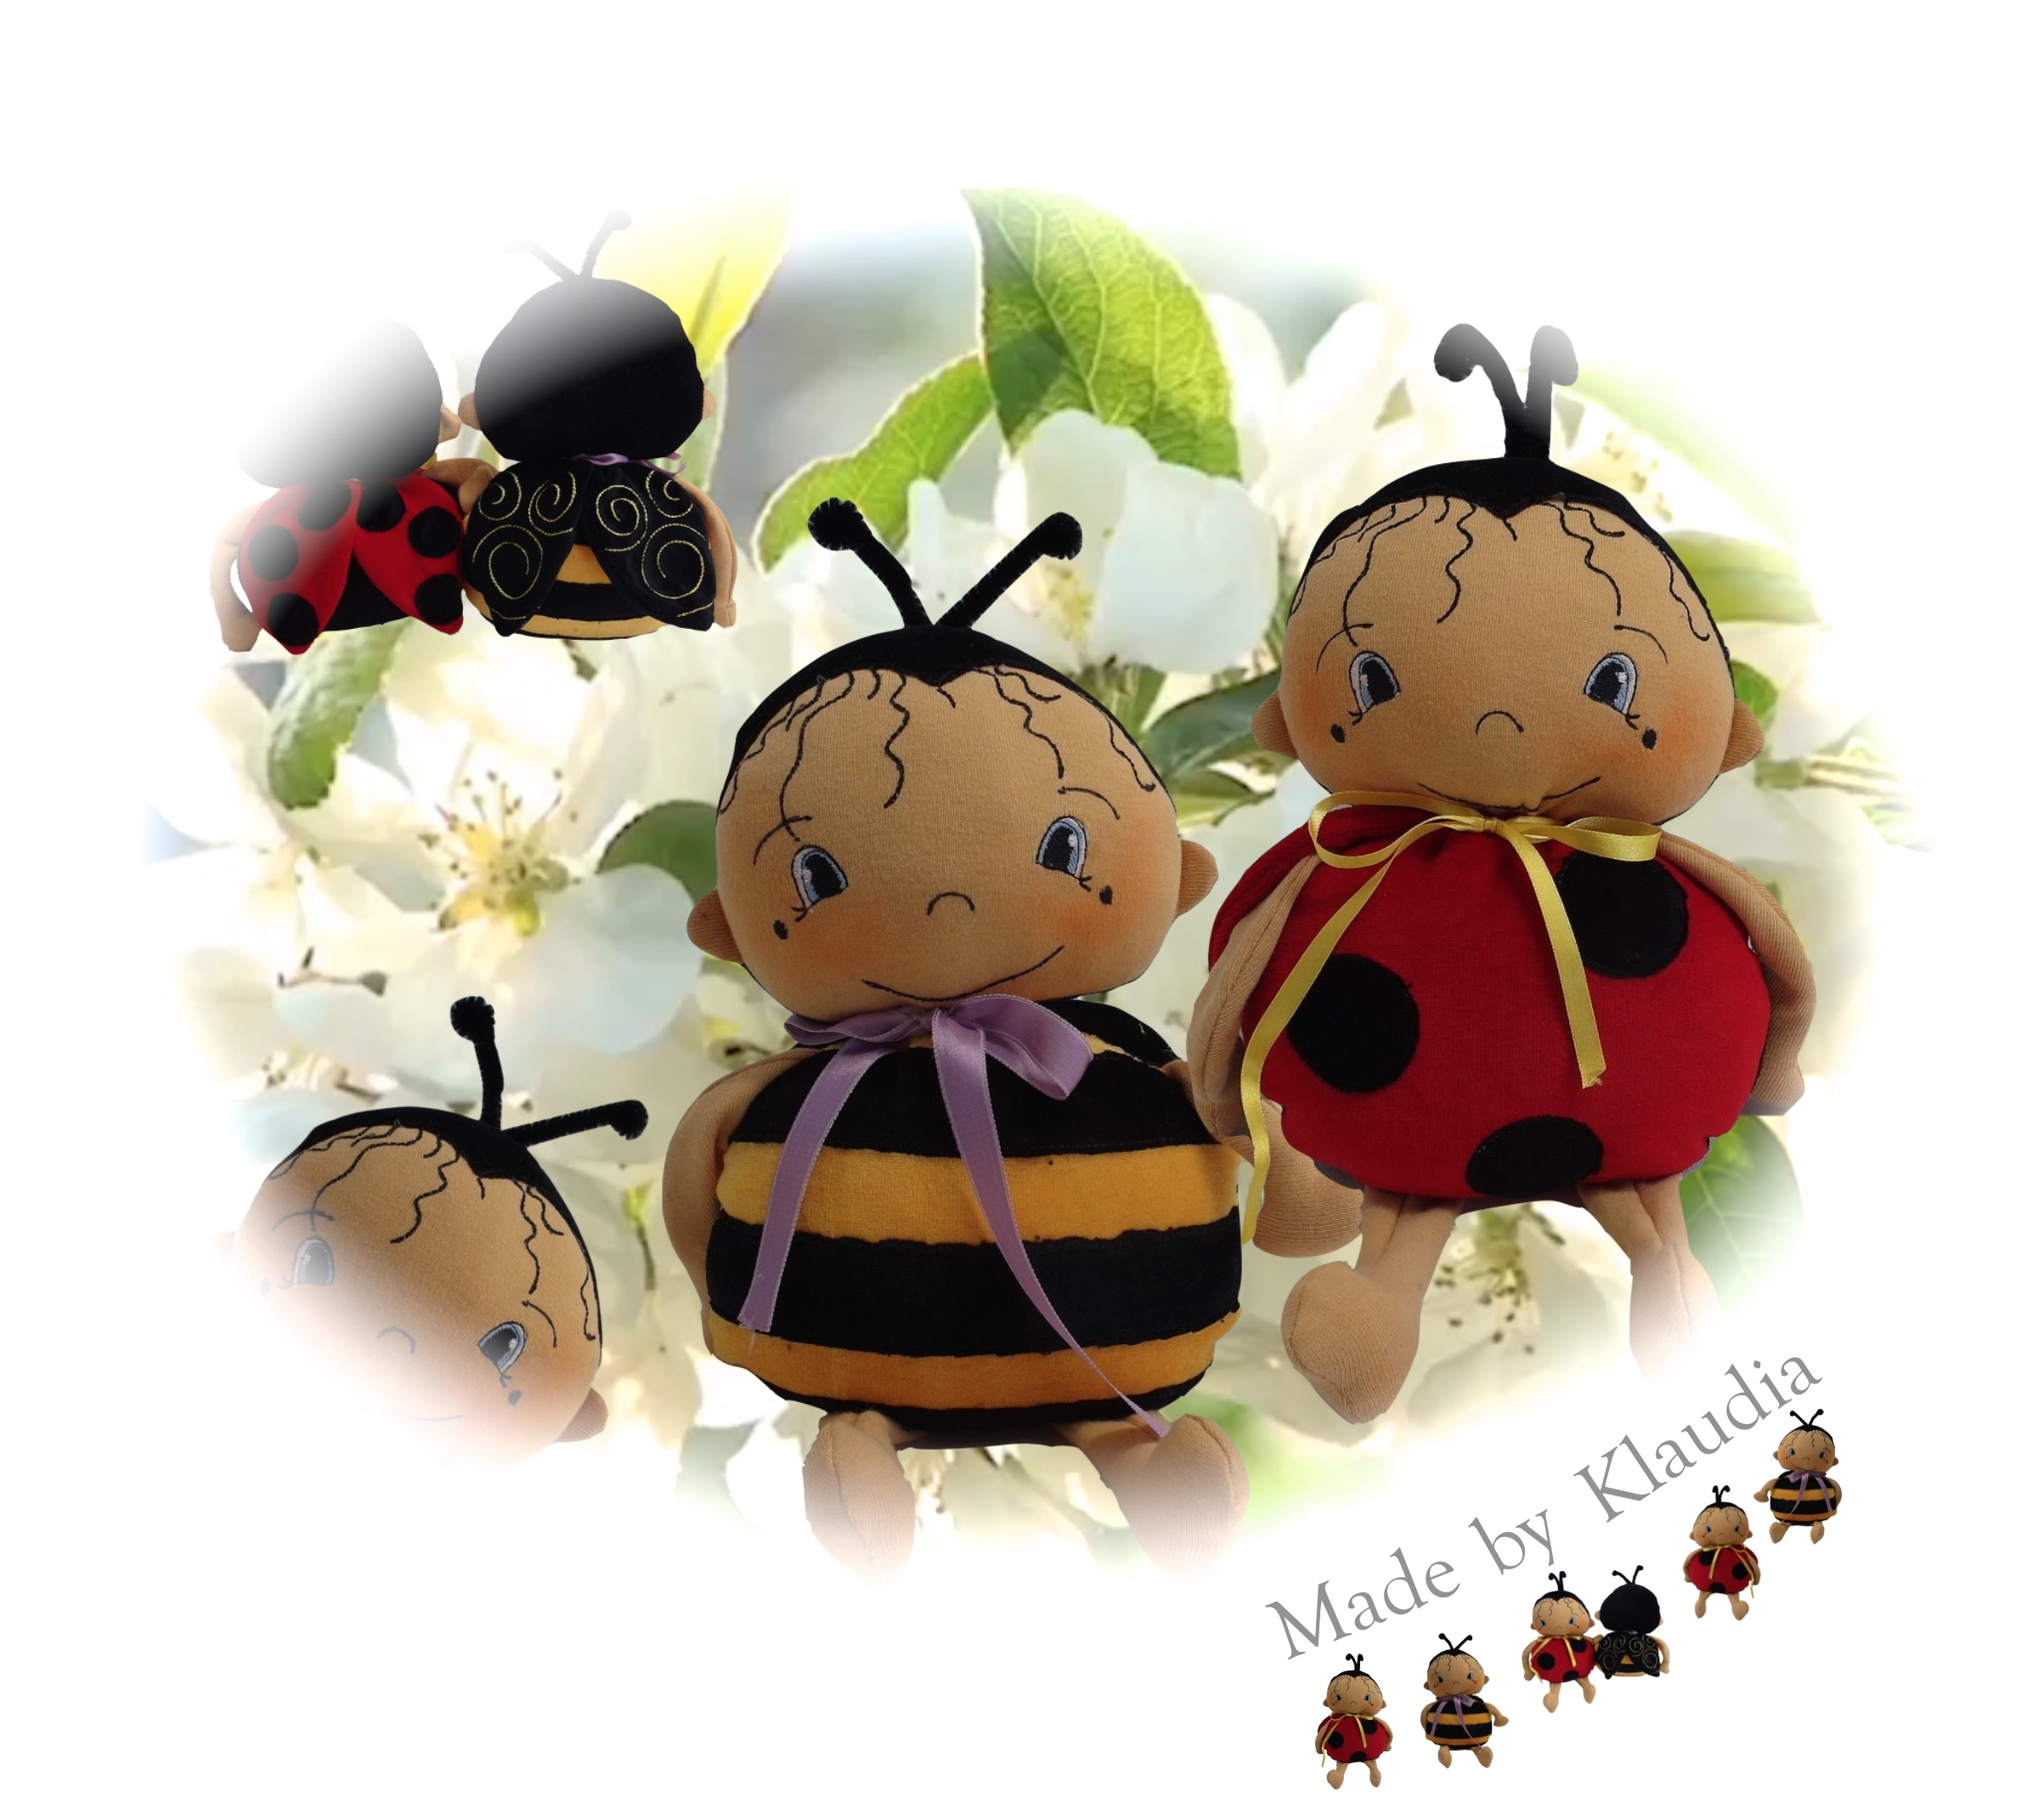 Insekten Duo Klaudia